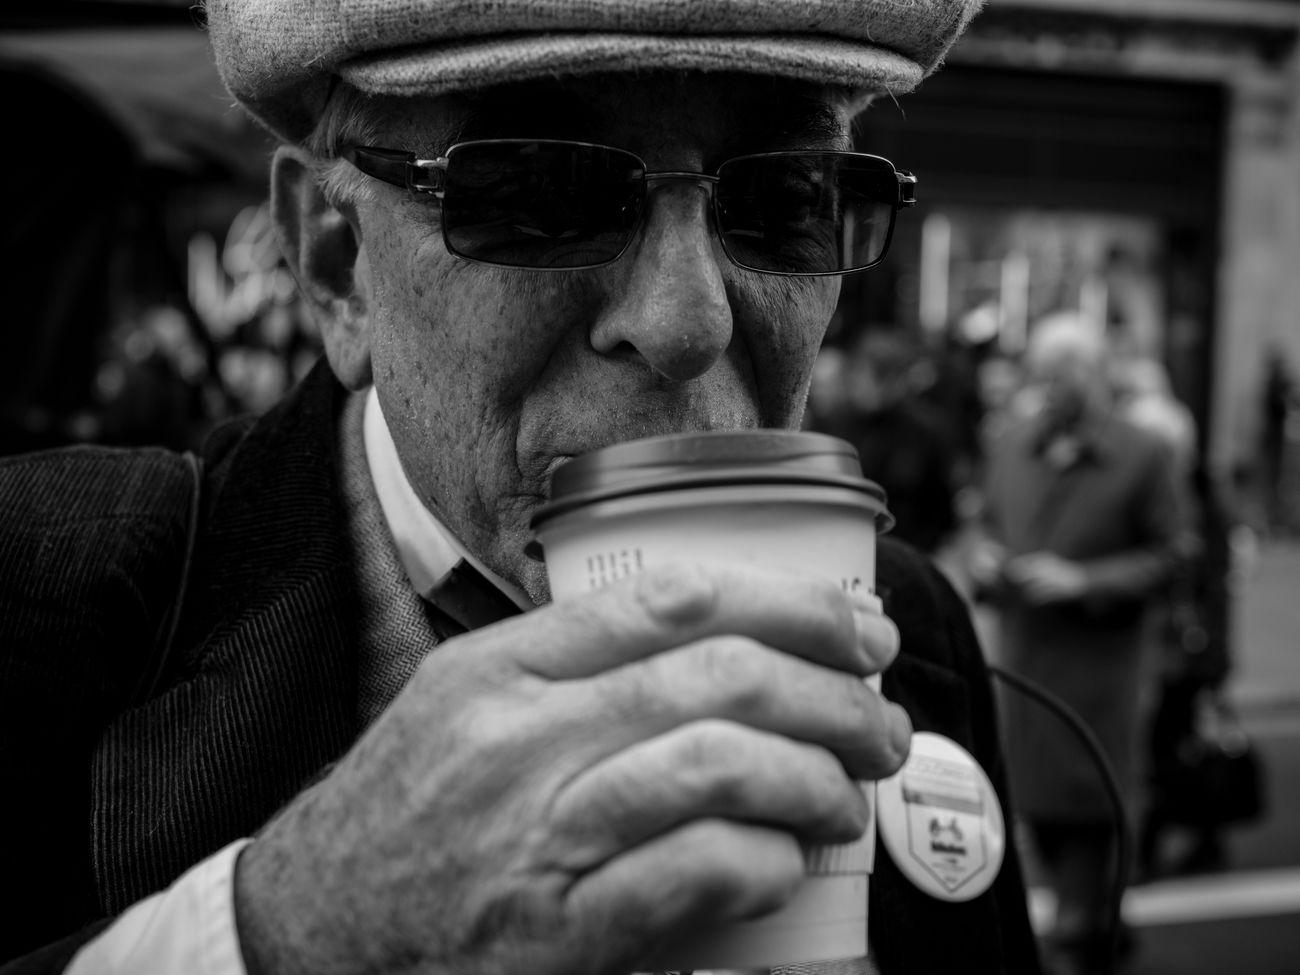 Coffee Time. Streetphotography People Candid City Life London Maxgor Maxgor.com Prime Lens Streetlife Monochrome Photography Black And White Photography Street Portraiture 35mm Lifestyles London Lifestyle Portrait Regent Street  Olympus Pen F Olympus Pen-f Stranger Rawstreets